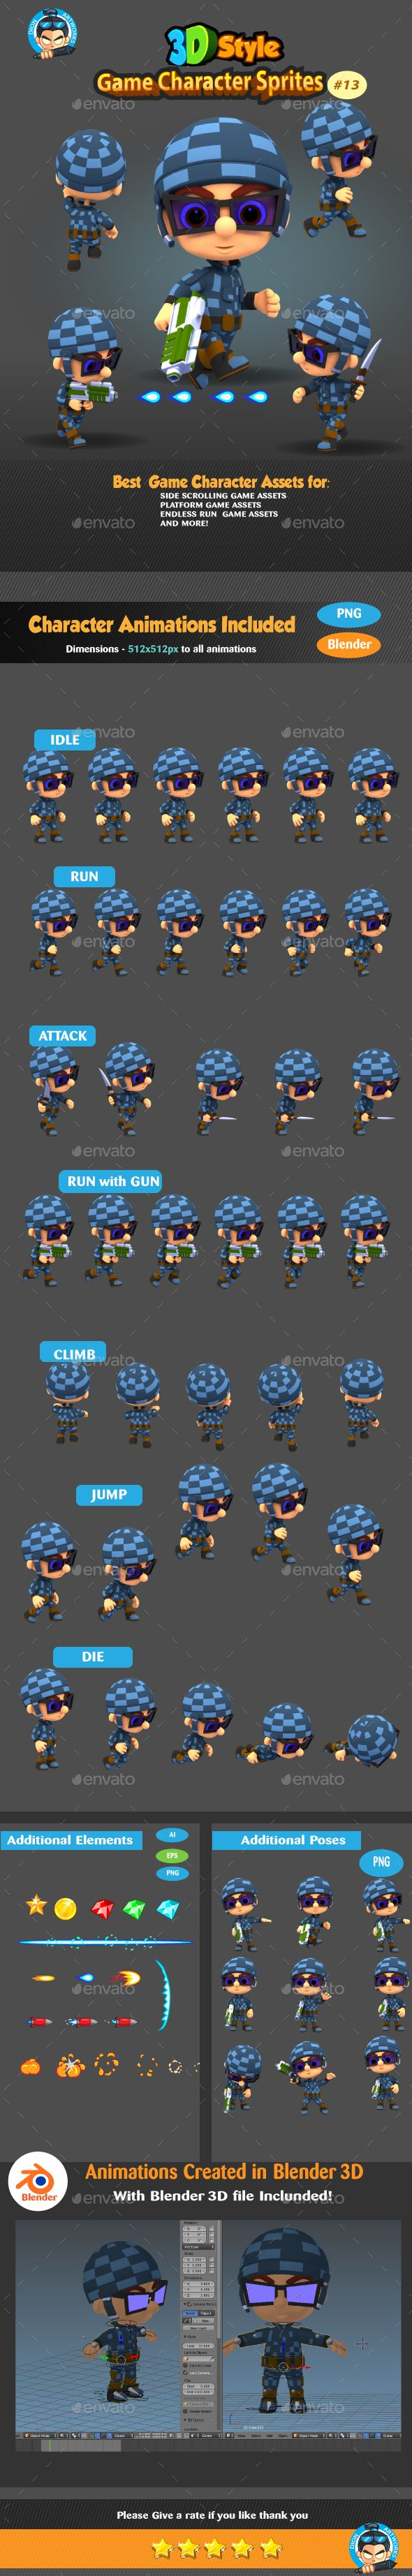 Character Design Free Download : Best game ux ui kits assets design images on